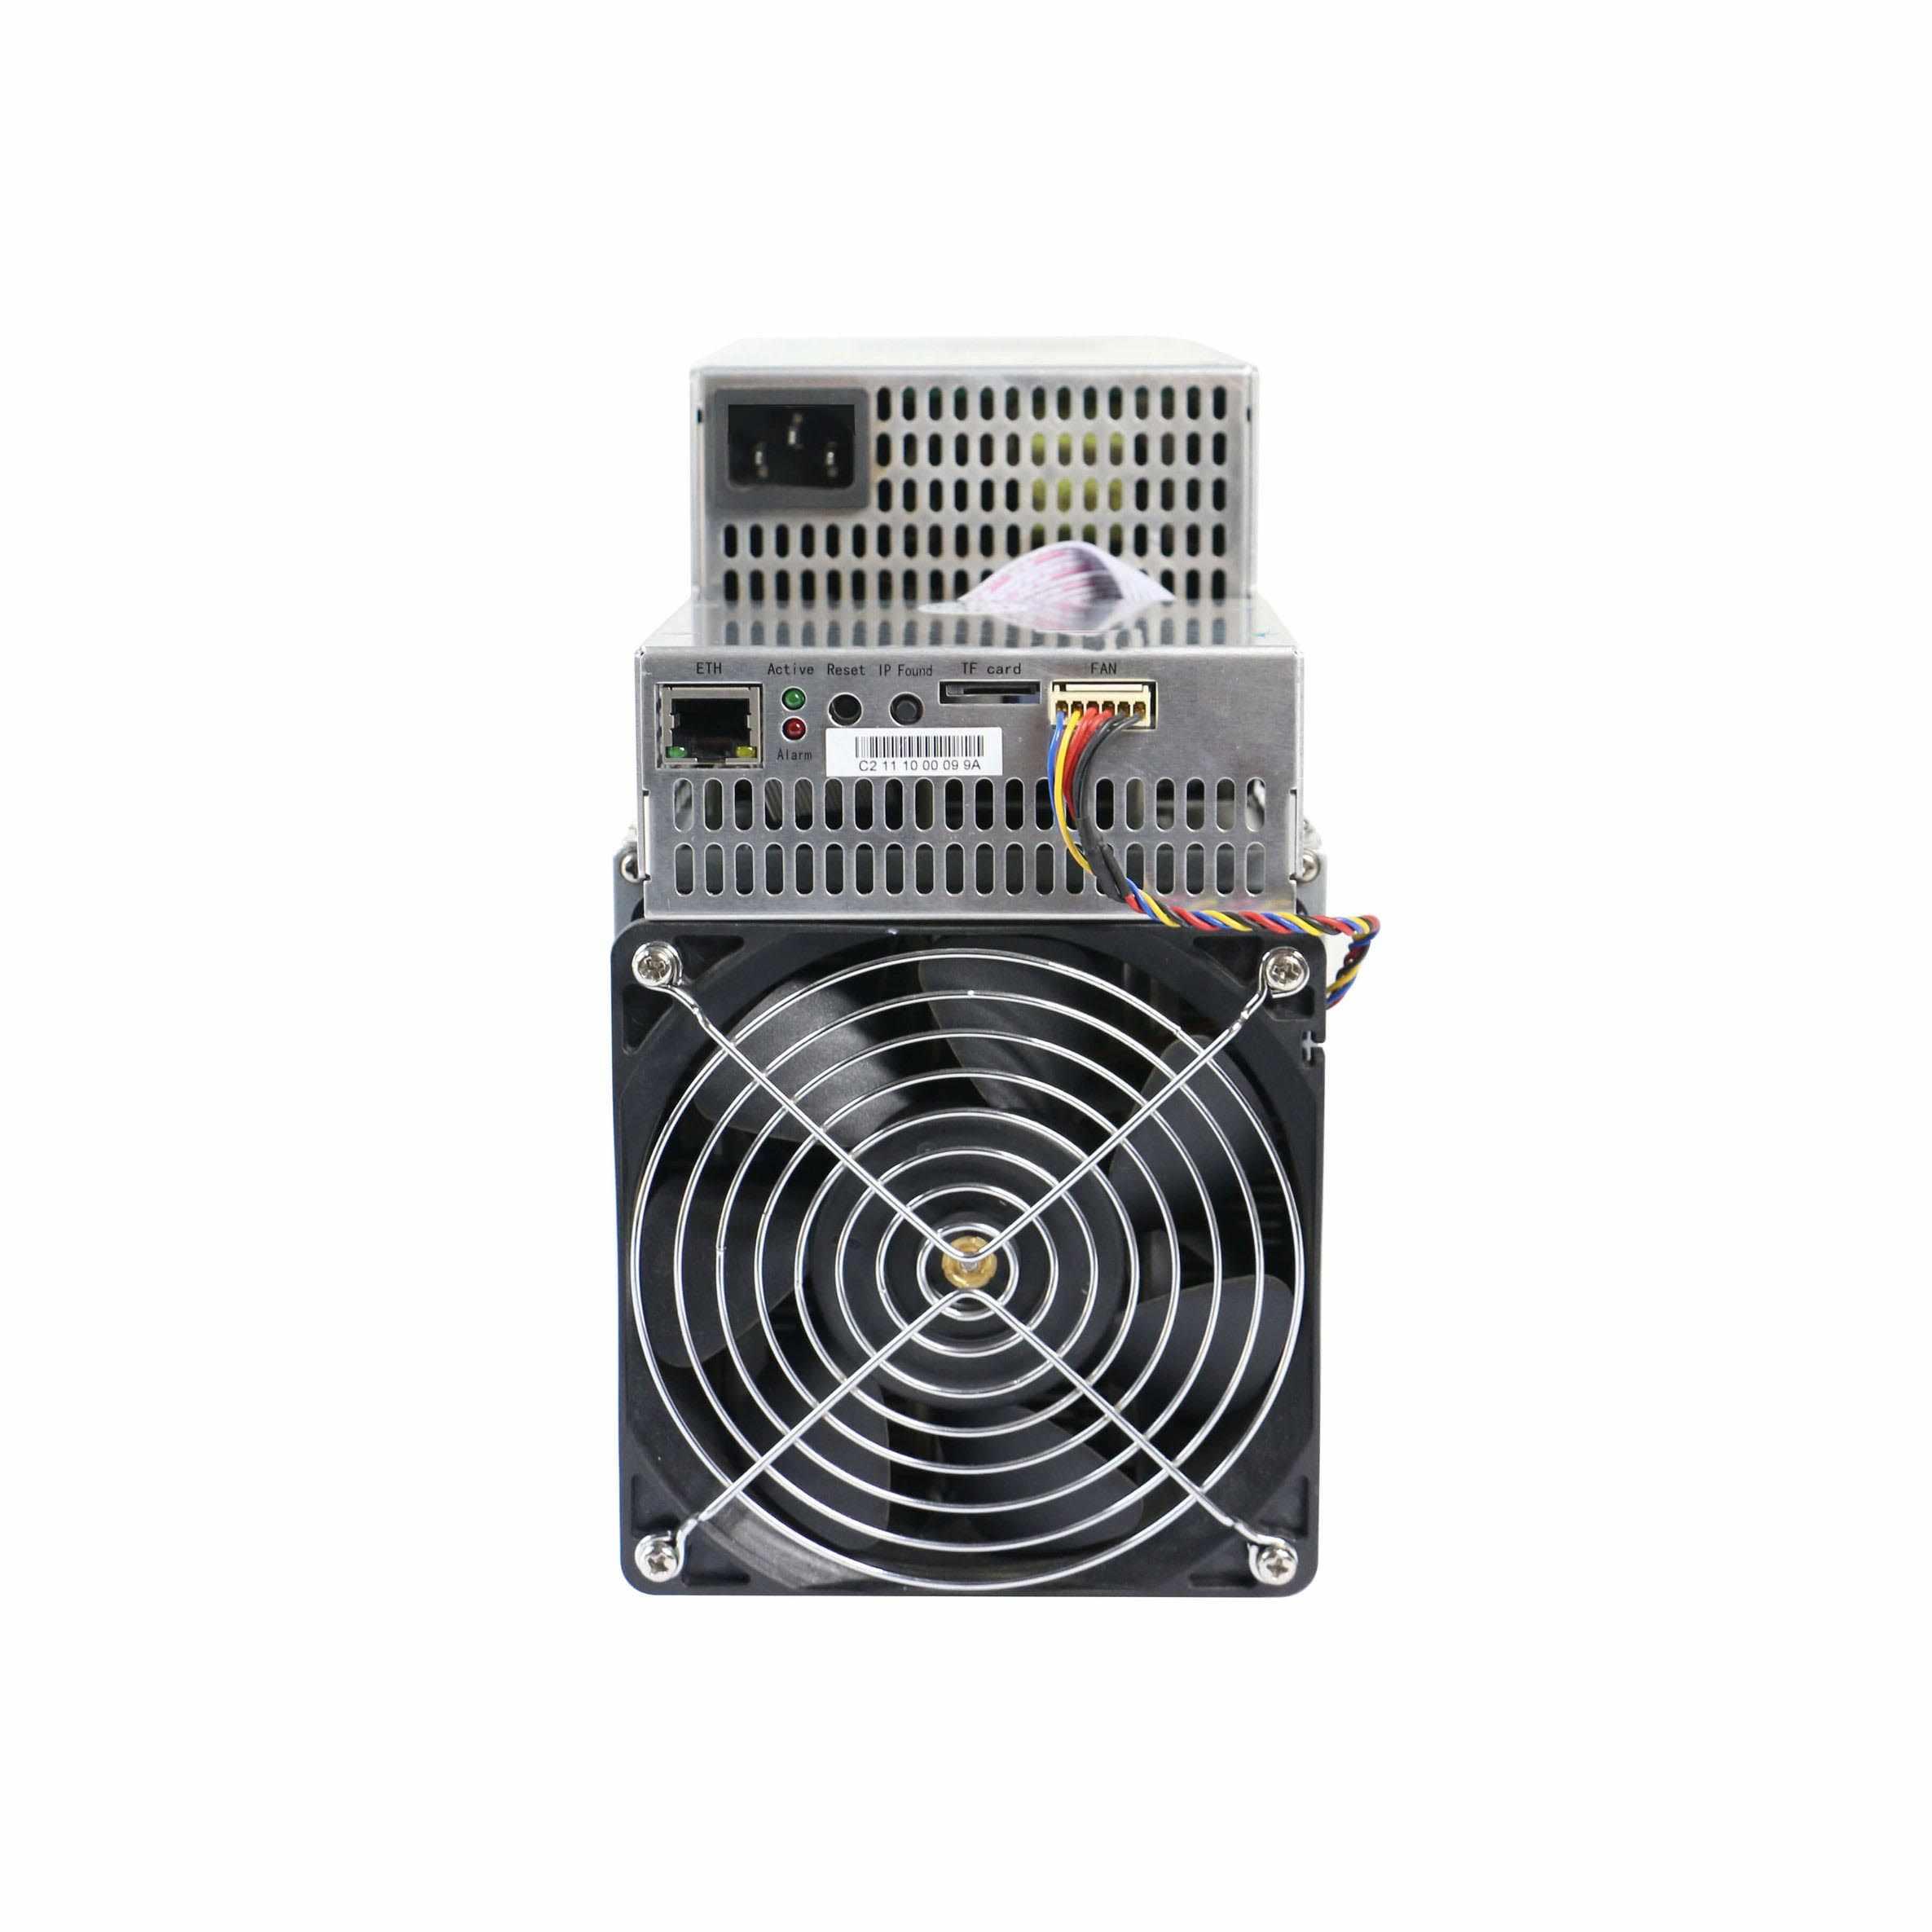 Nuevo ASIC minero BTC BCH minero WhatsMiner M20S 68T mejor que Antminer S9 S17 S17 Pro T17 T17e S17e M3 M21S Innosilicon T2T T3